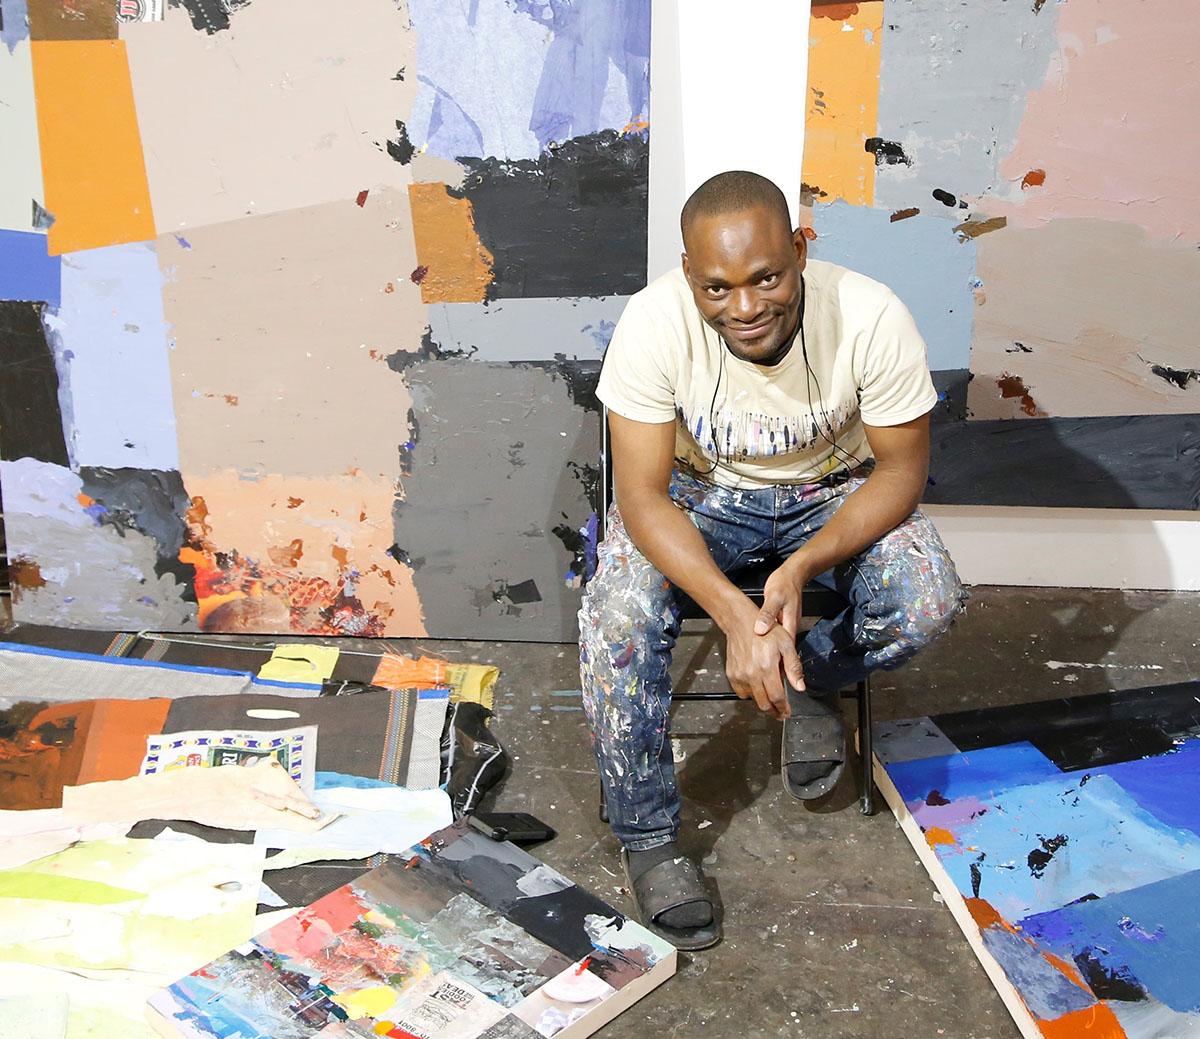 An artist working in a studio